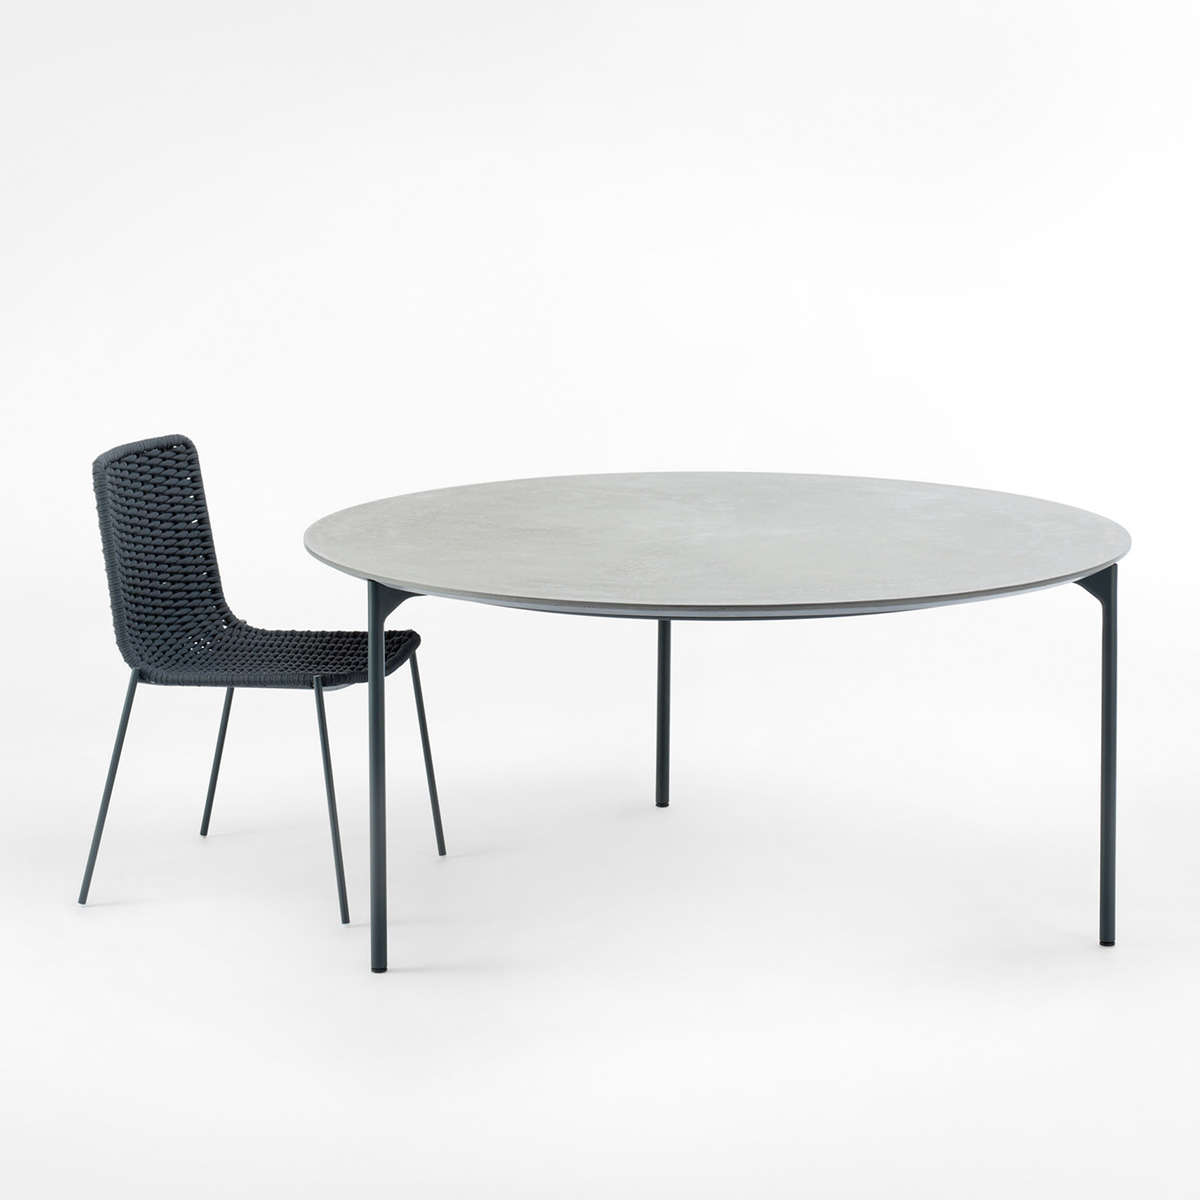 Paola Lenti Kiti Dining Chair Studio 6